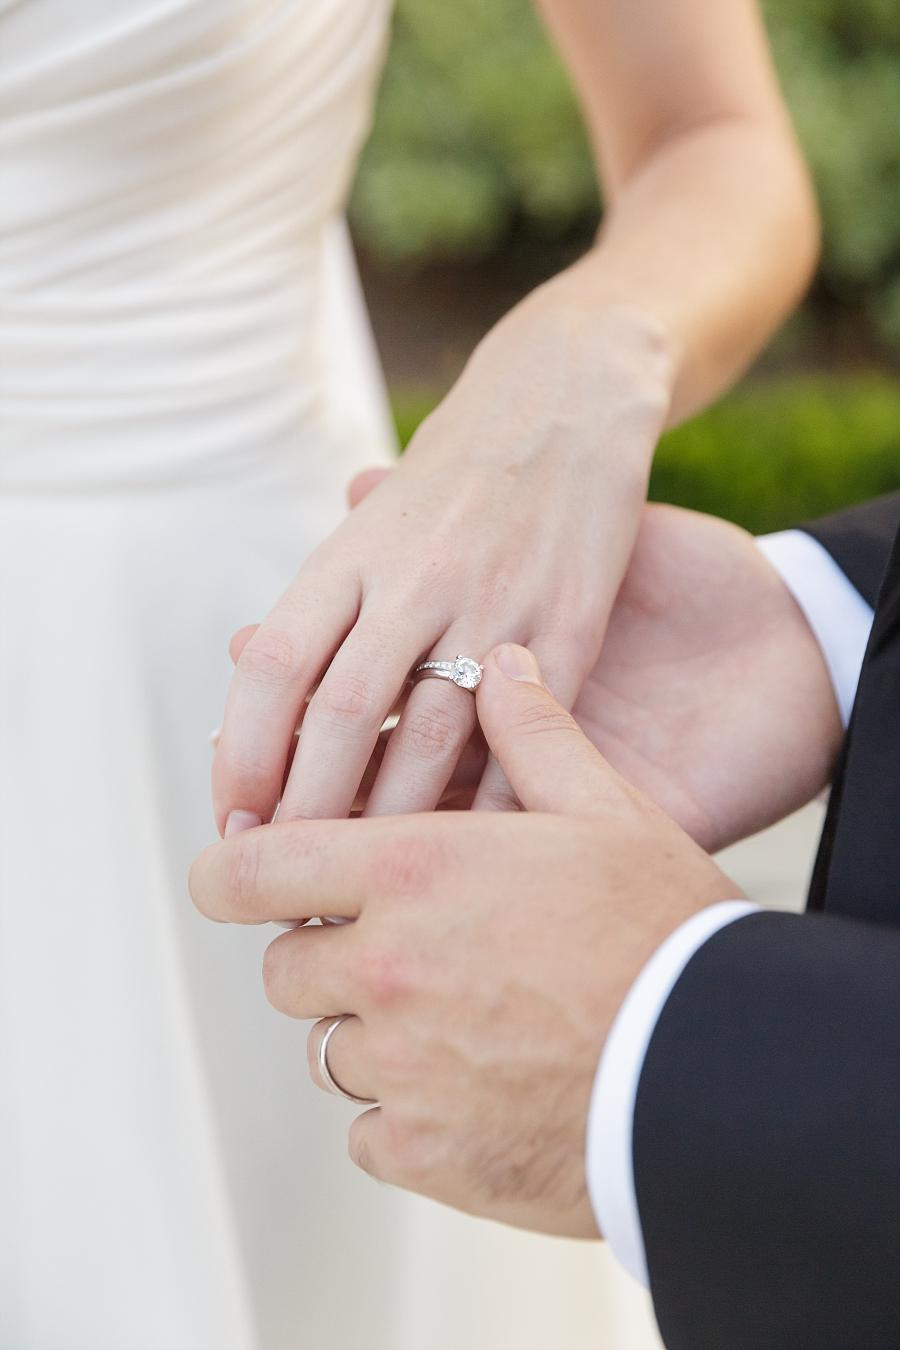 Stacy-Anderson-Photography-McGovern-Centennial-Gardens-Houston-Wedding-Photographer_0062.jpg